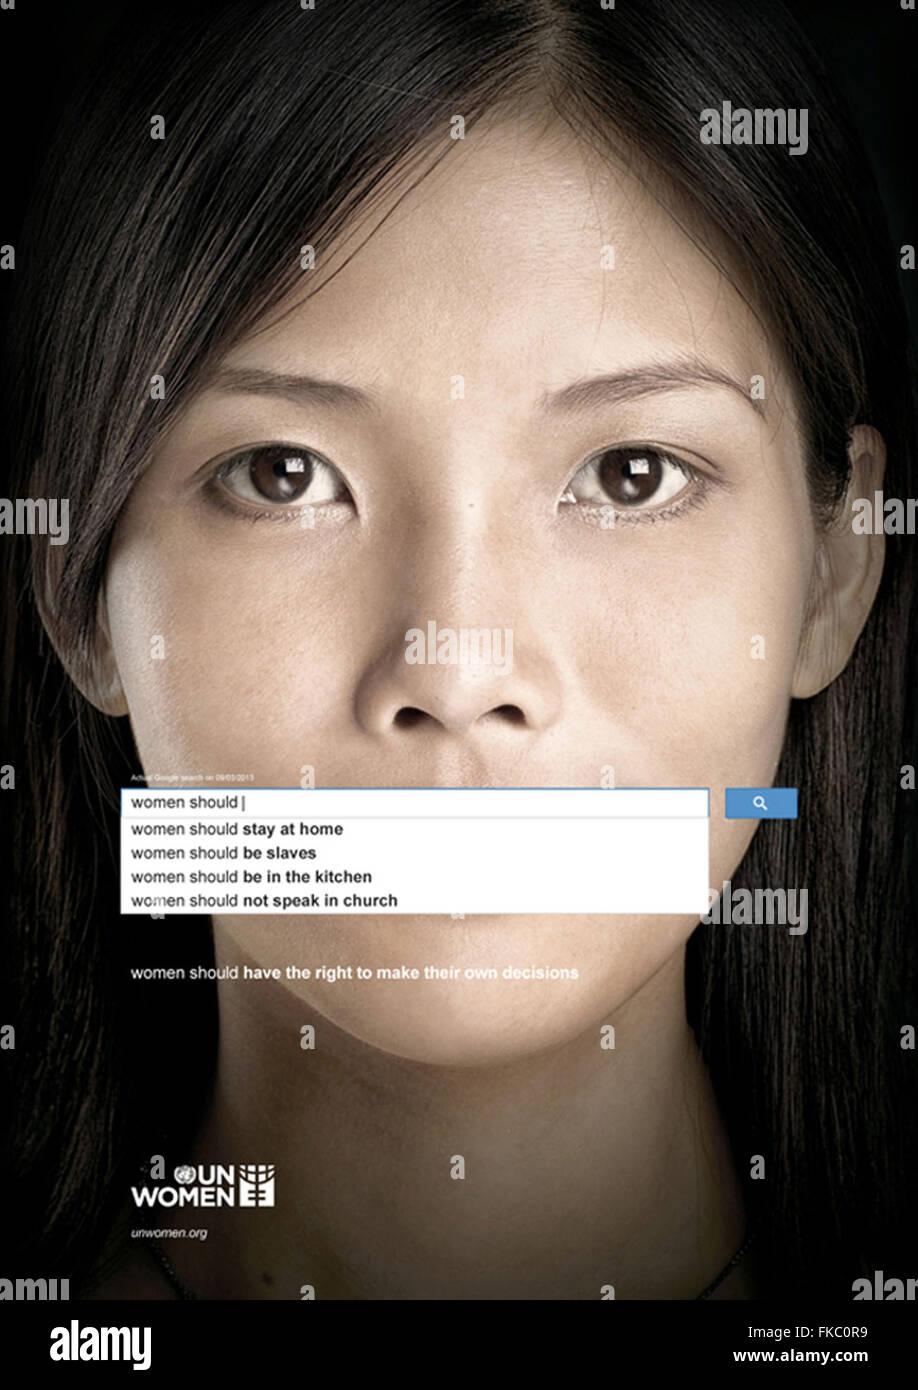 2010er Jahre UK UN Women Magazin Anzeige Stockbild